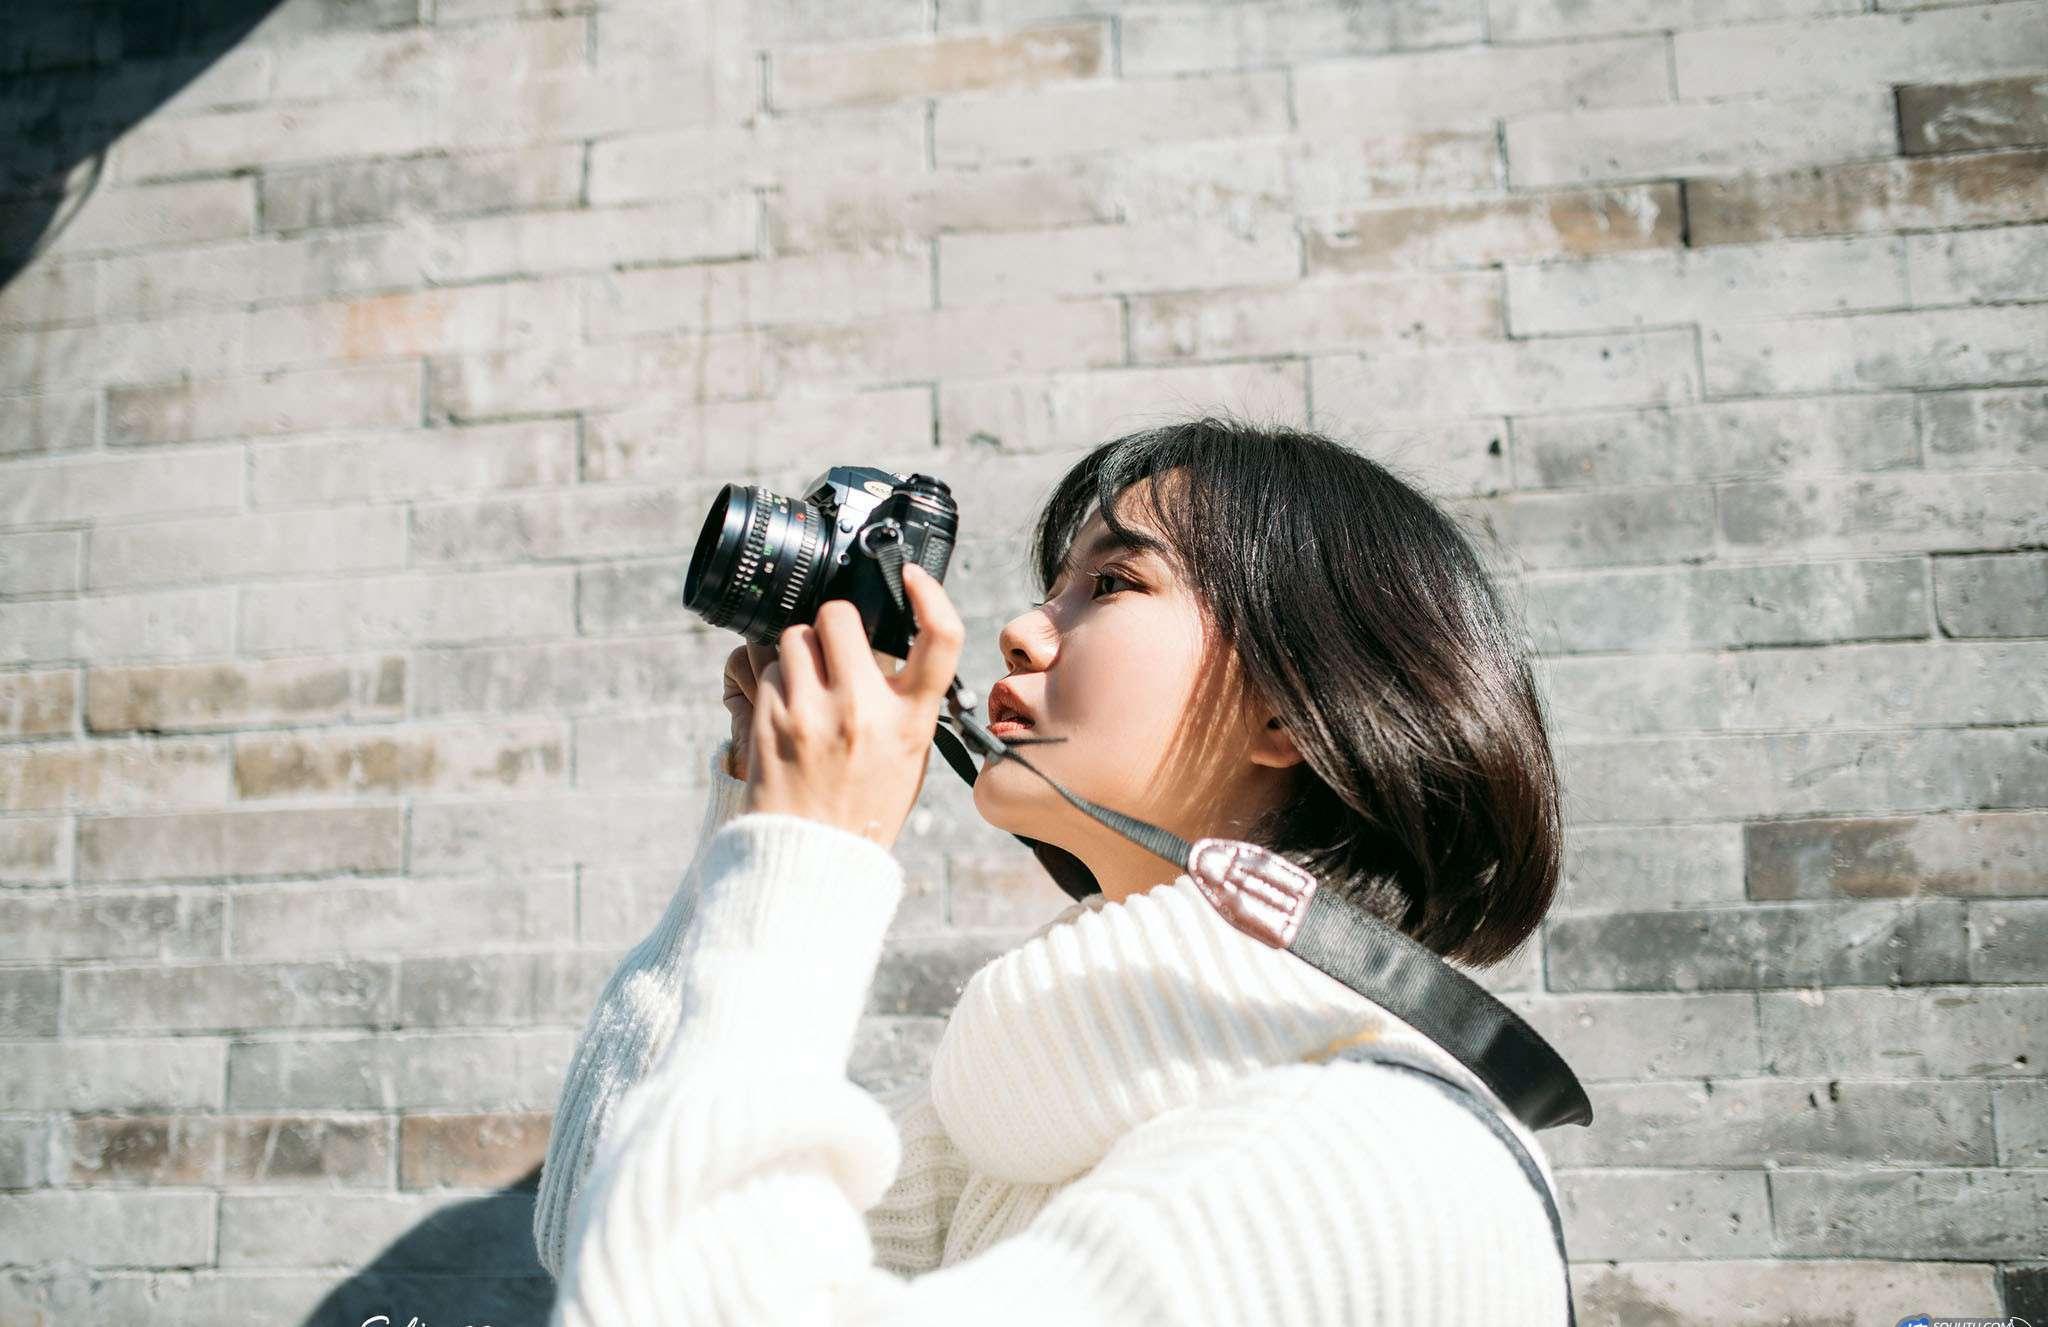 LXVS-016颓废美女上演忧郁慵懒